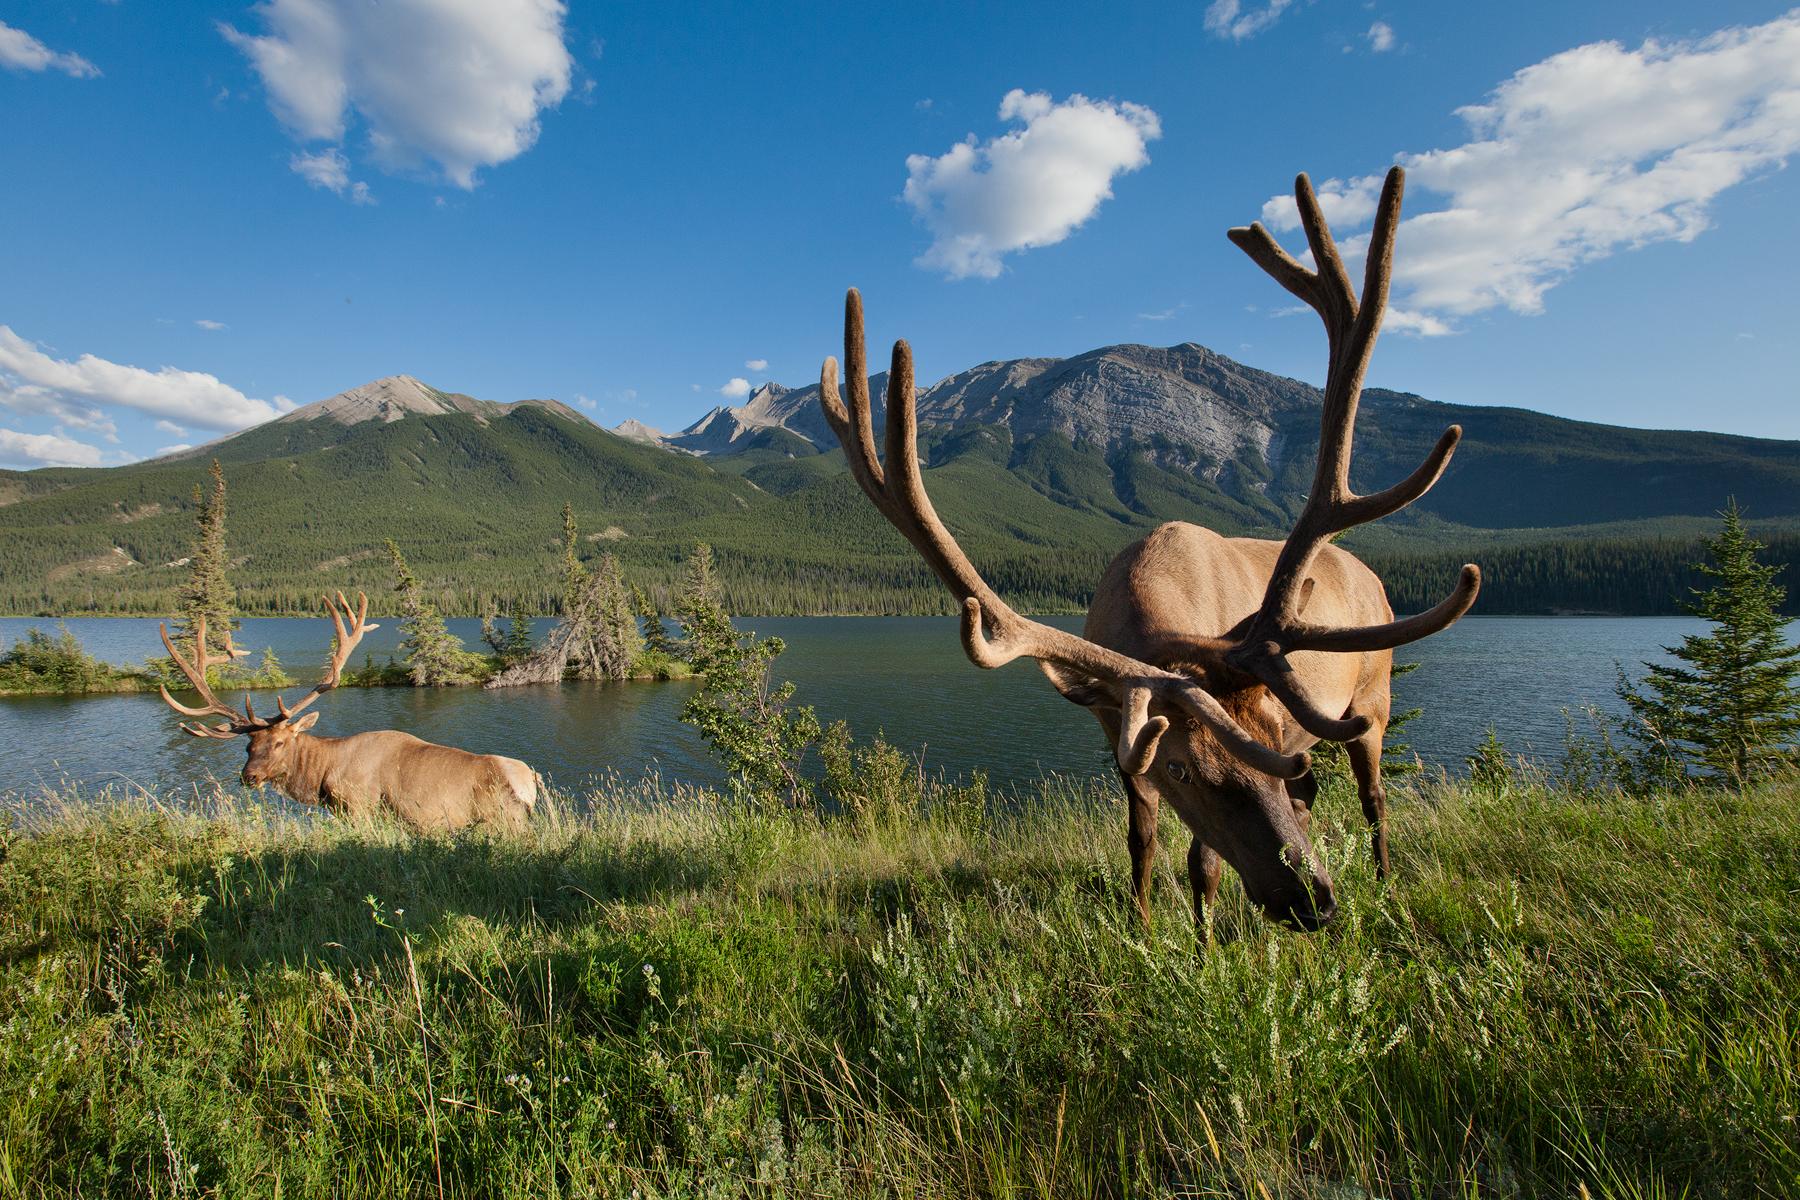 Two bull Rocky Mountain Elk feed along Talbot Lake in Jasper National Park, Canada.  Image ©Connor Stefanison